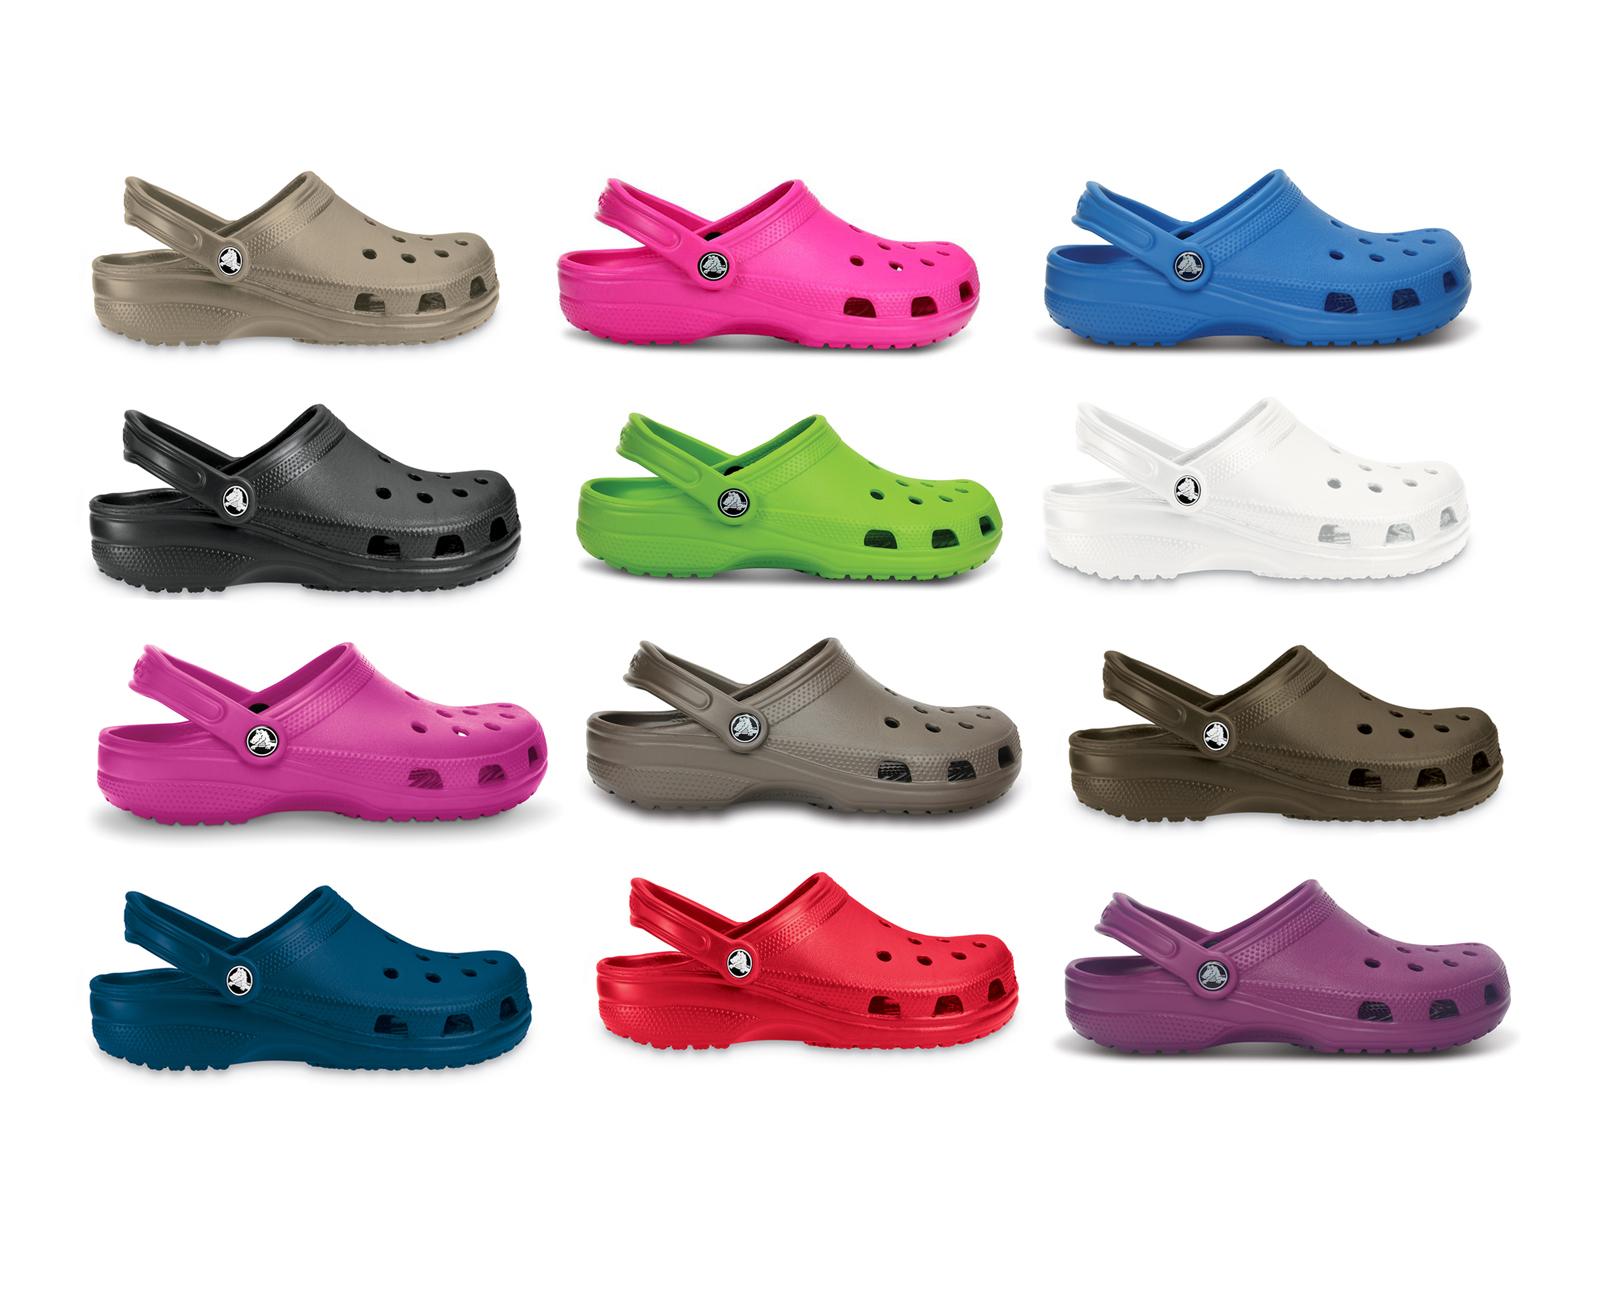 Unisex Classic Clogs Crocs 5xJrm8